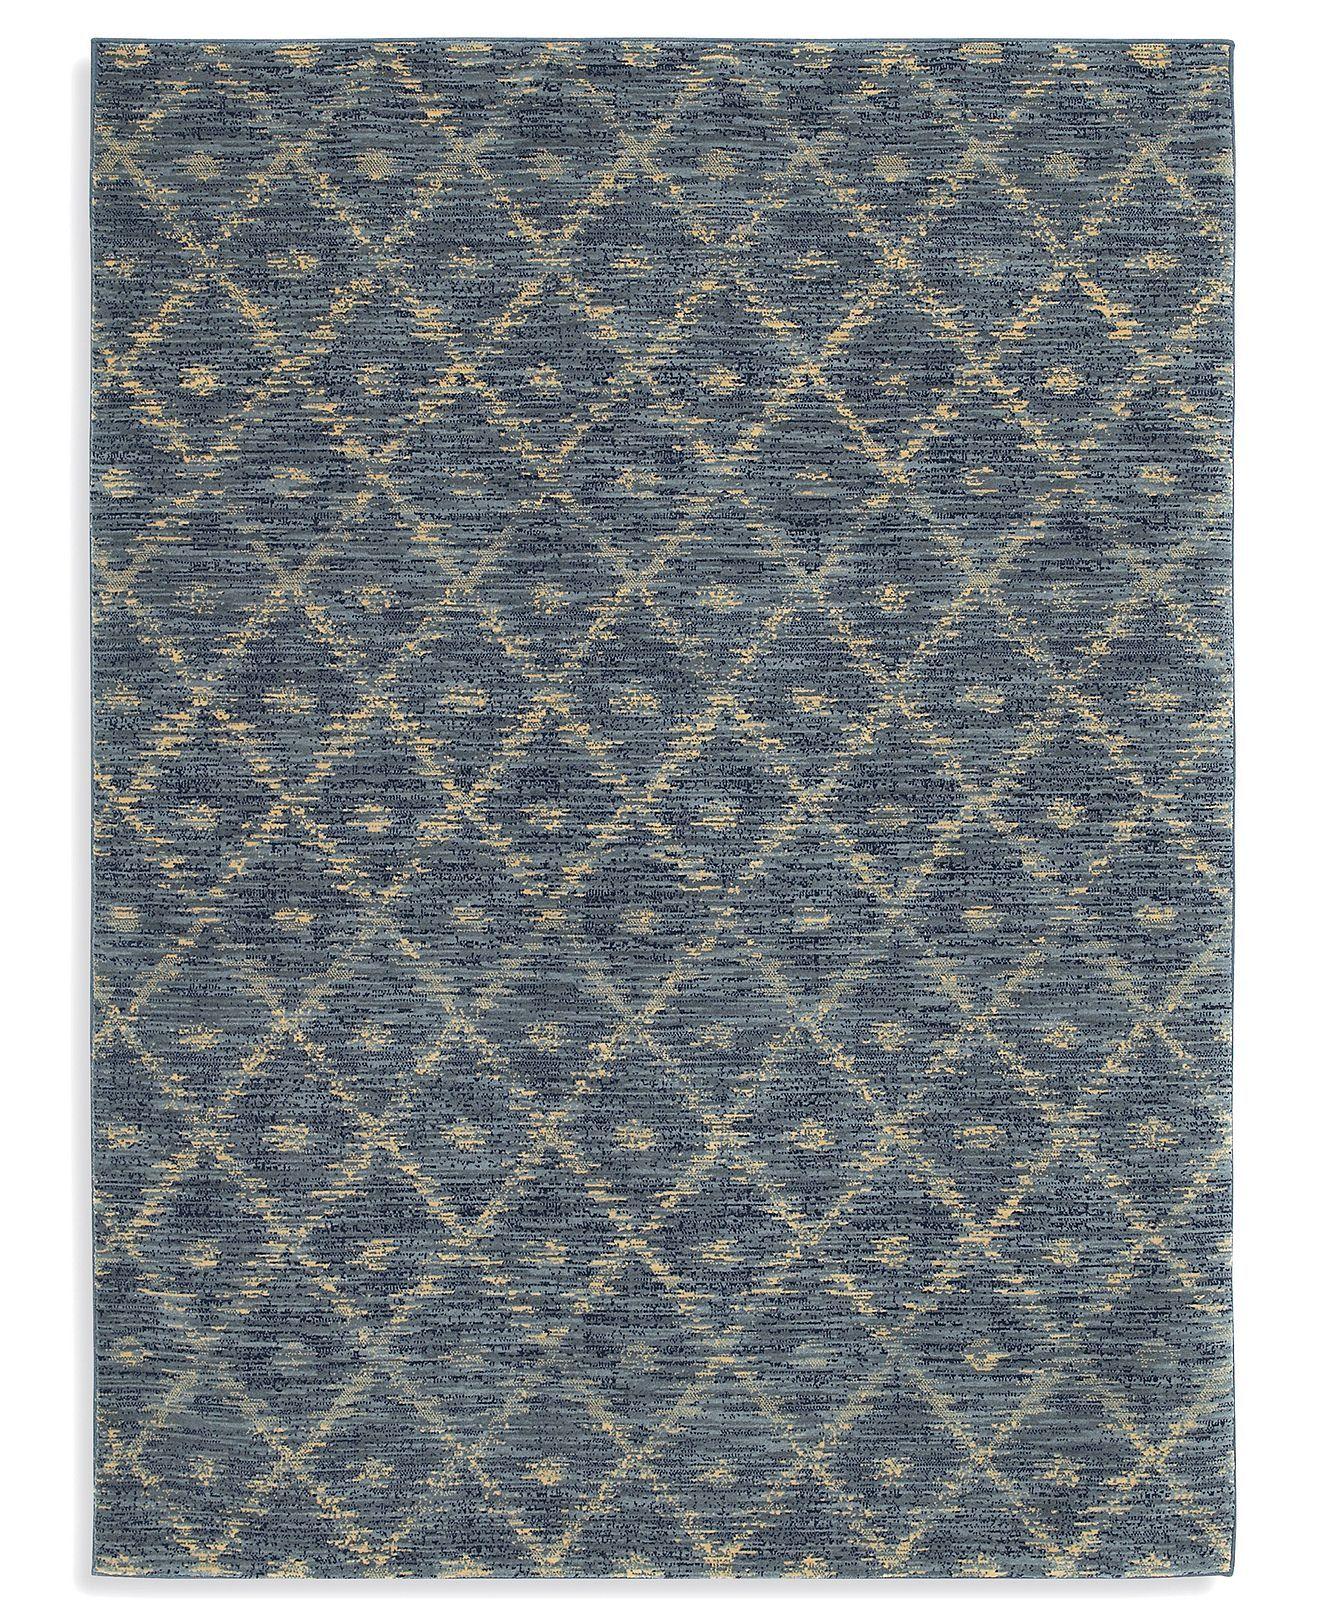 Karastan Area Rug Woven Impressions Diamond Ikat Indigo 8 6 X 11 6 Traditional Rugs Rugs Macy S Quality Area Rugs Karastan Rugs